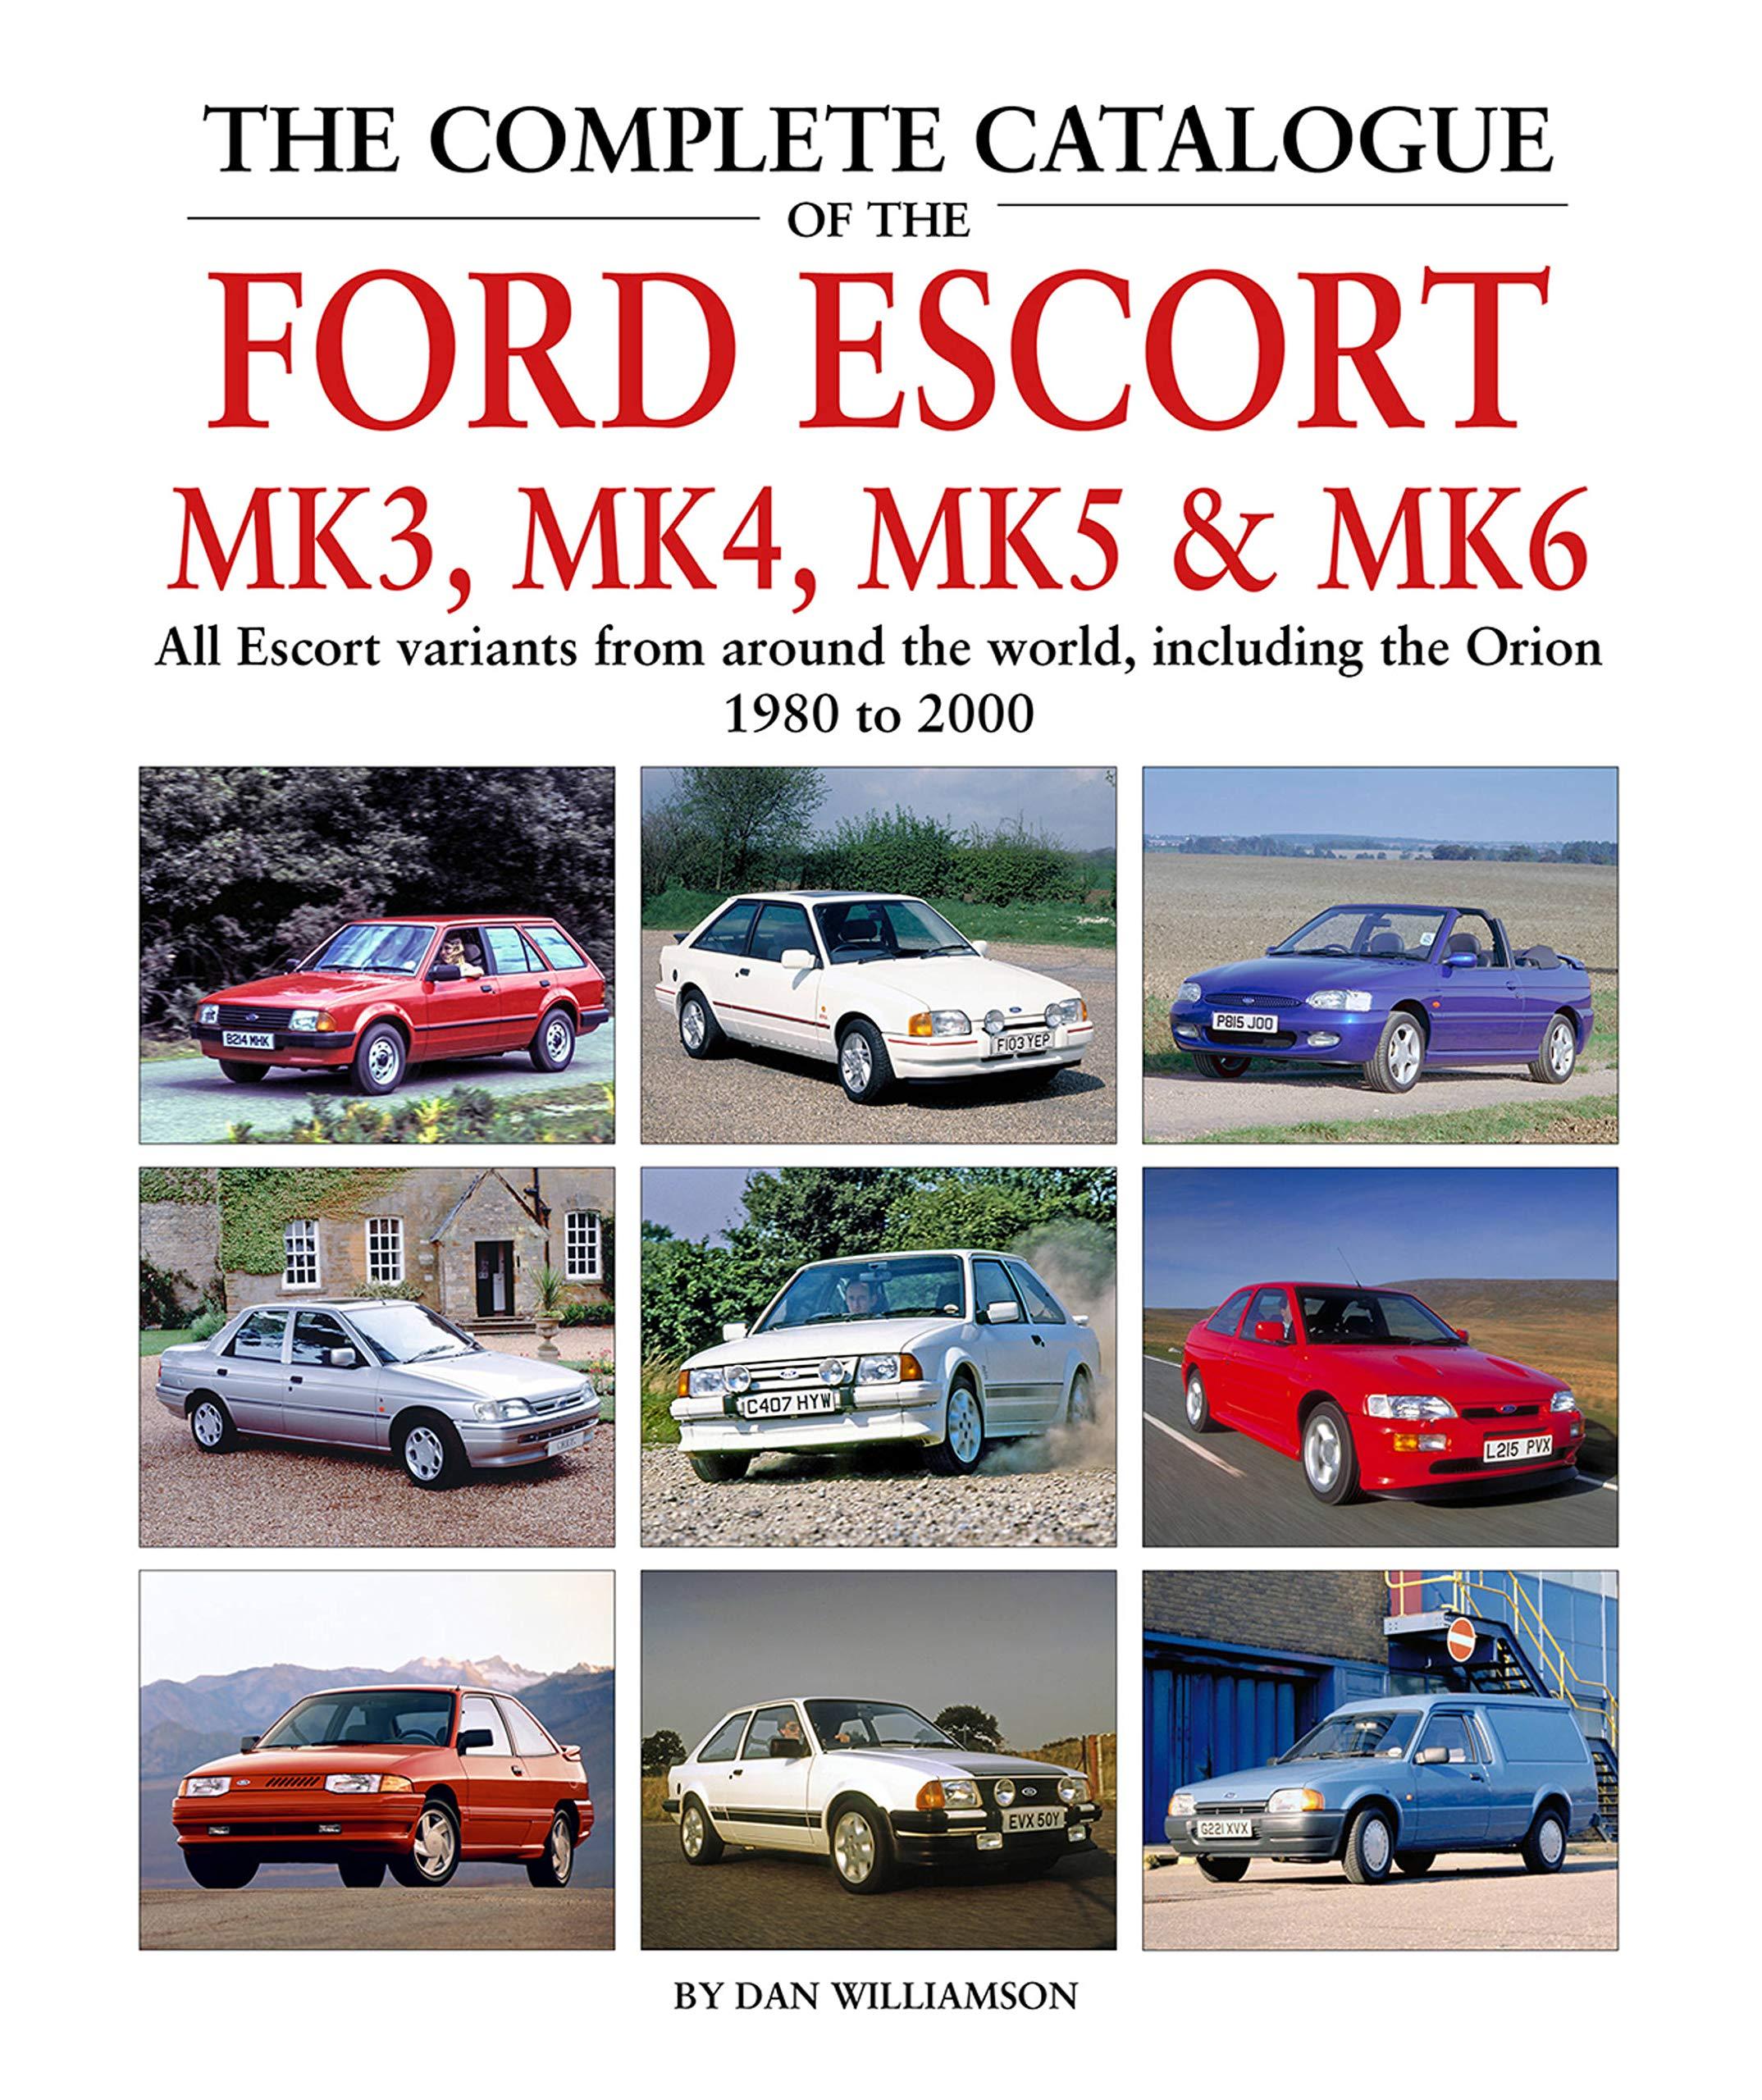 FORD ESCORT MK5 Estate Orion MK3 Ressorts Avant